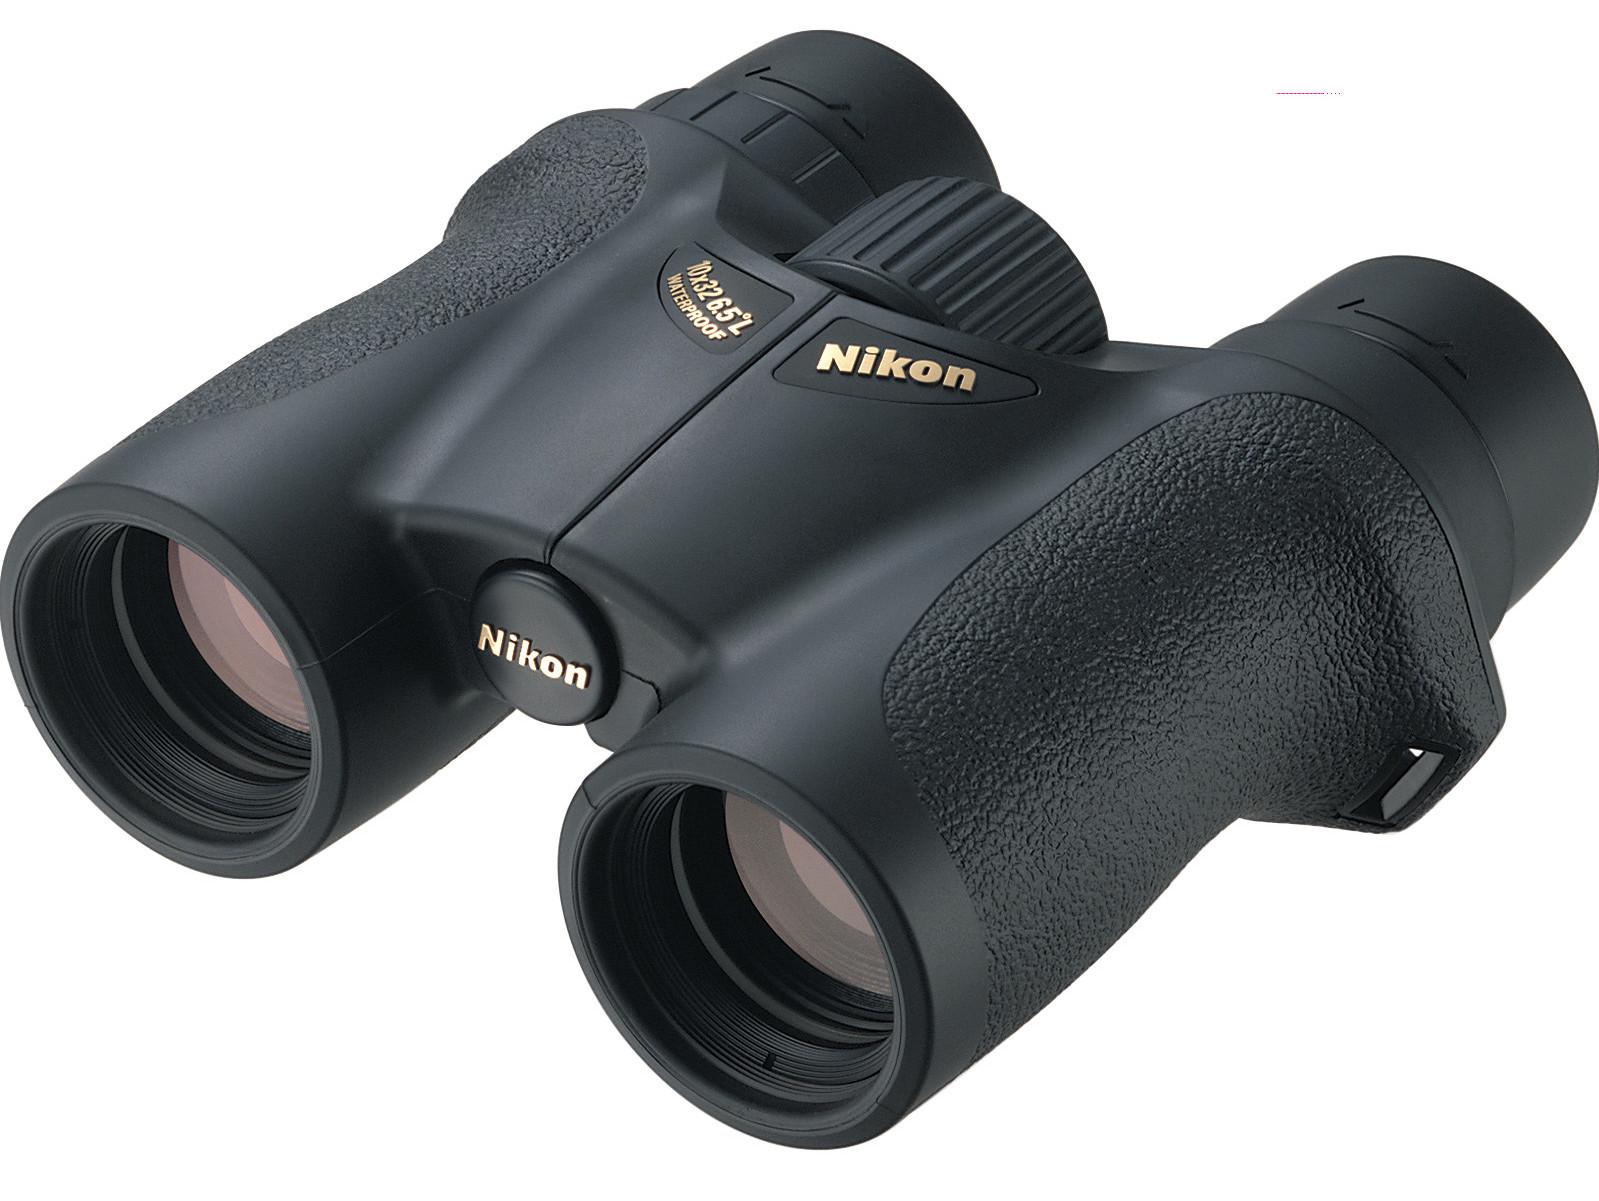 HG L DCF 10X32 雙筒望遠鏡 雙筒望遠鏡/單眼鏡-高眼點設計